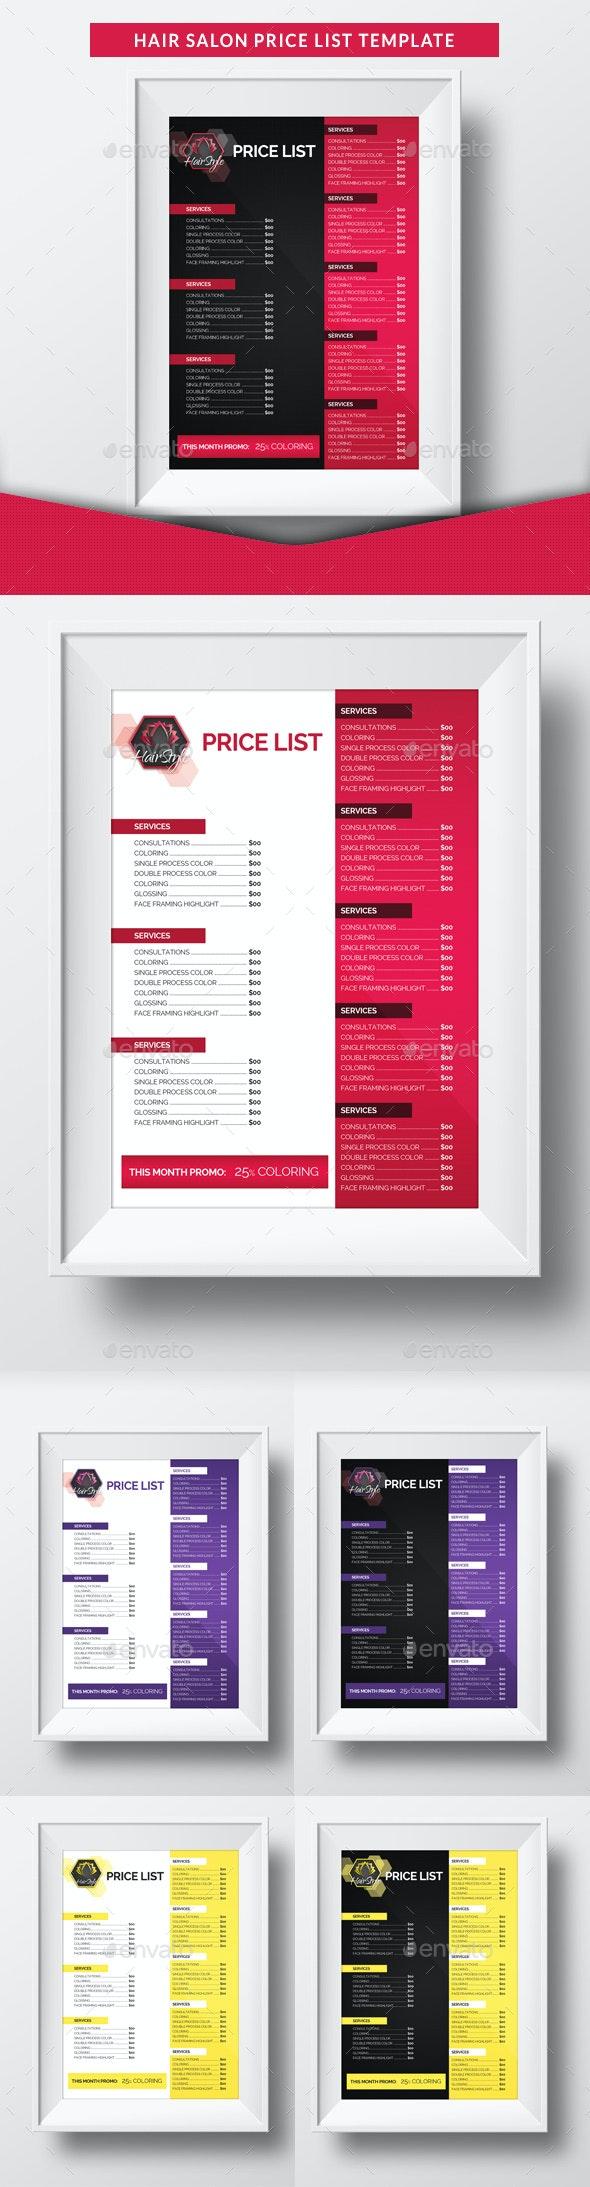 Hair Salon Price List Template - Miscellaneous Print Templates